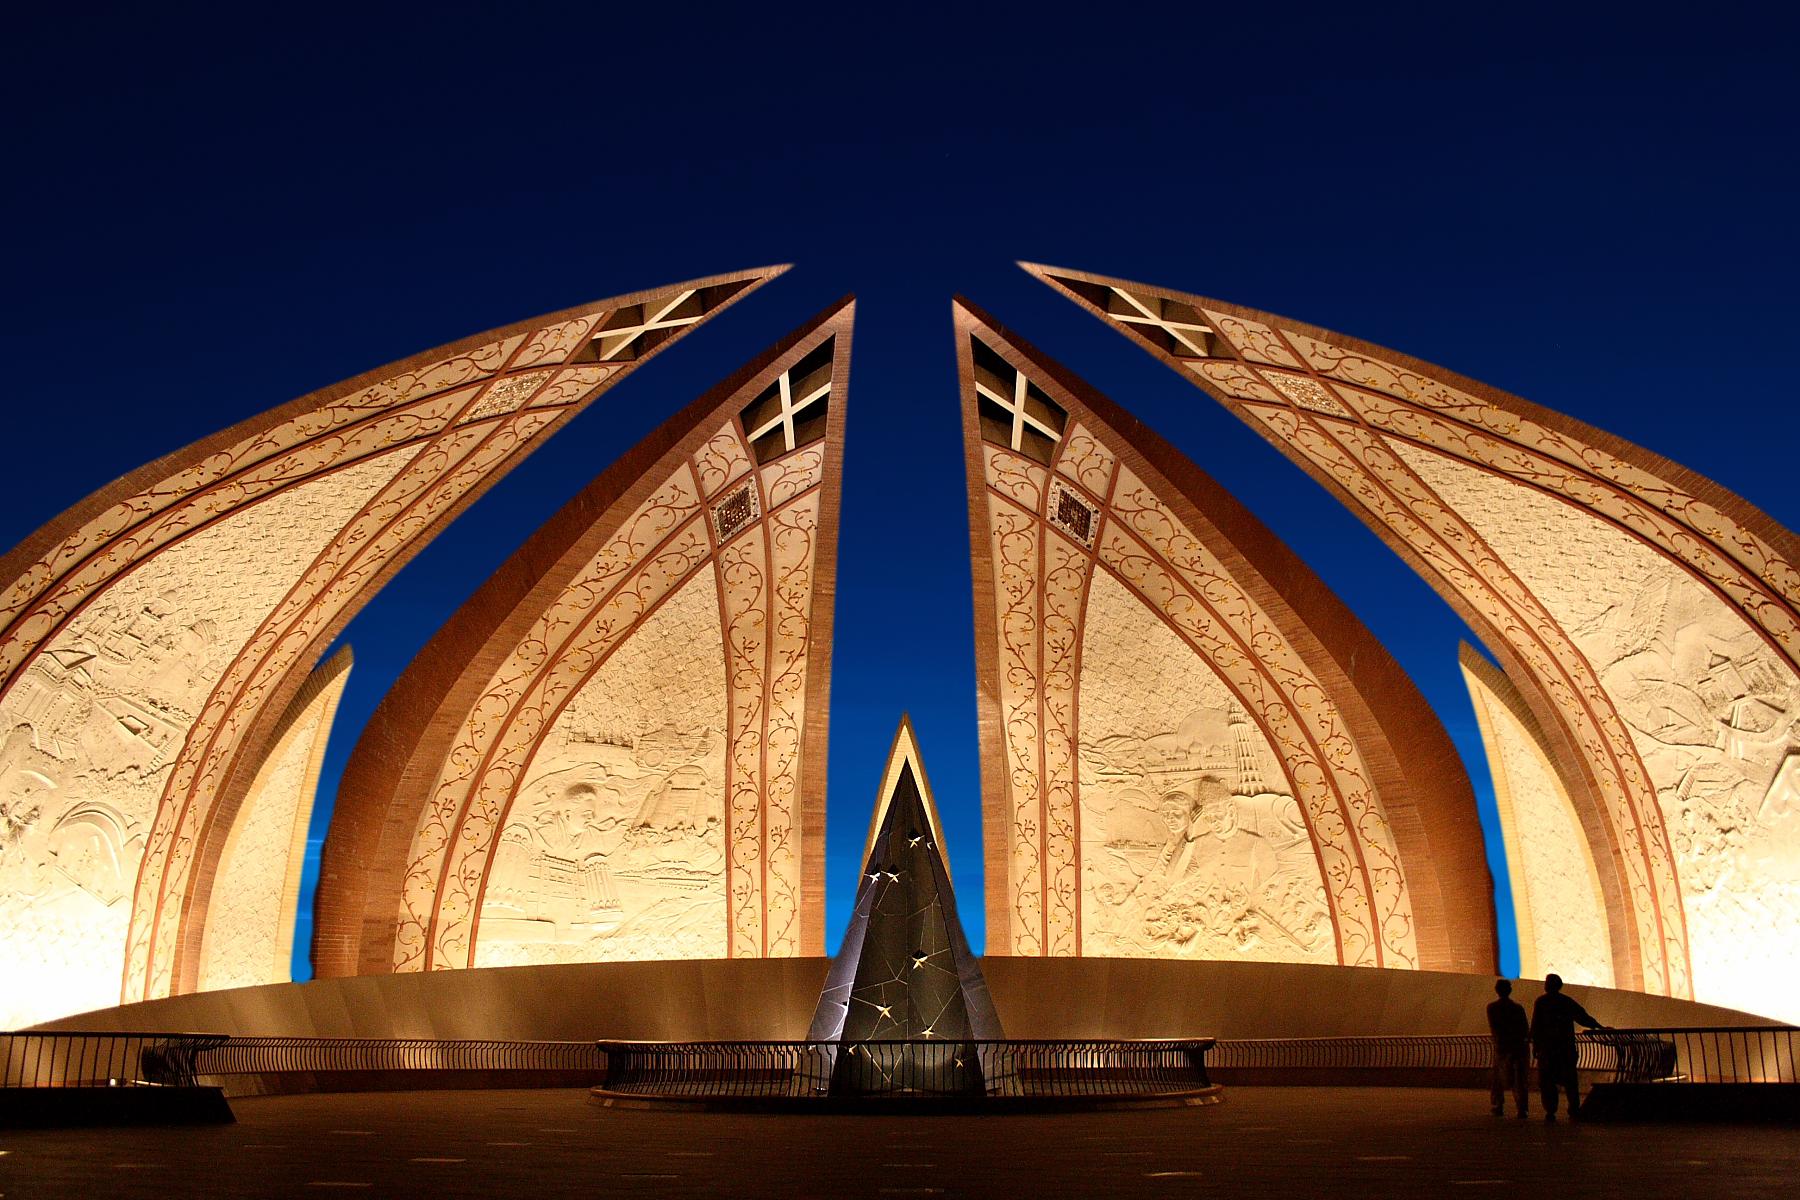 Pakistan Monument, Islamabad. [1800x1200]